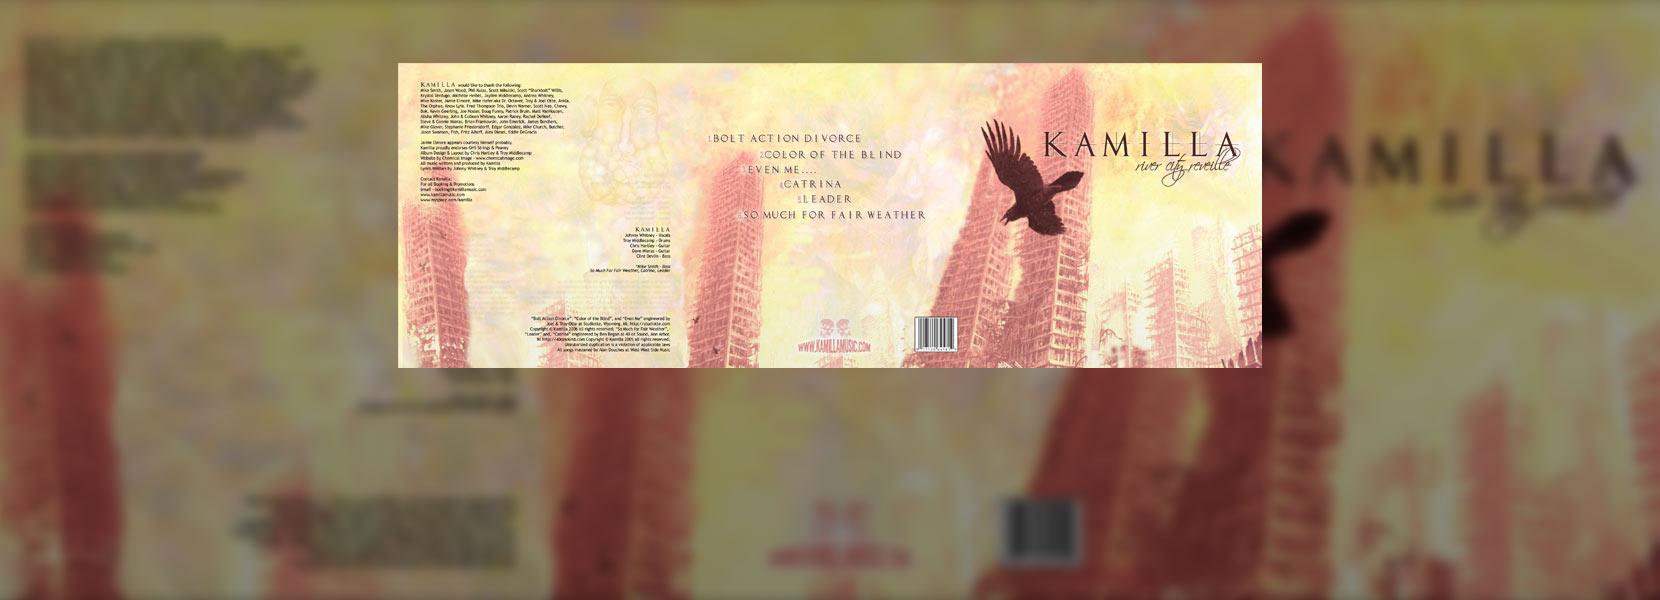 http://kamillamusic.com/wp-content/uploads/2014/11/River-City-Reveille-Inside2.jpg